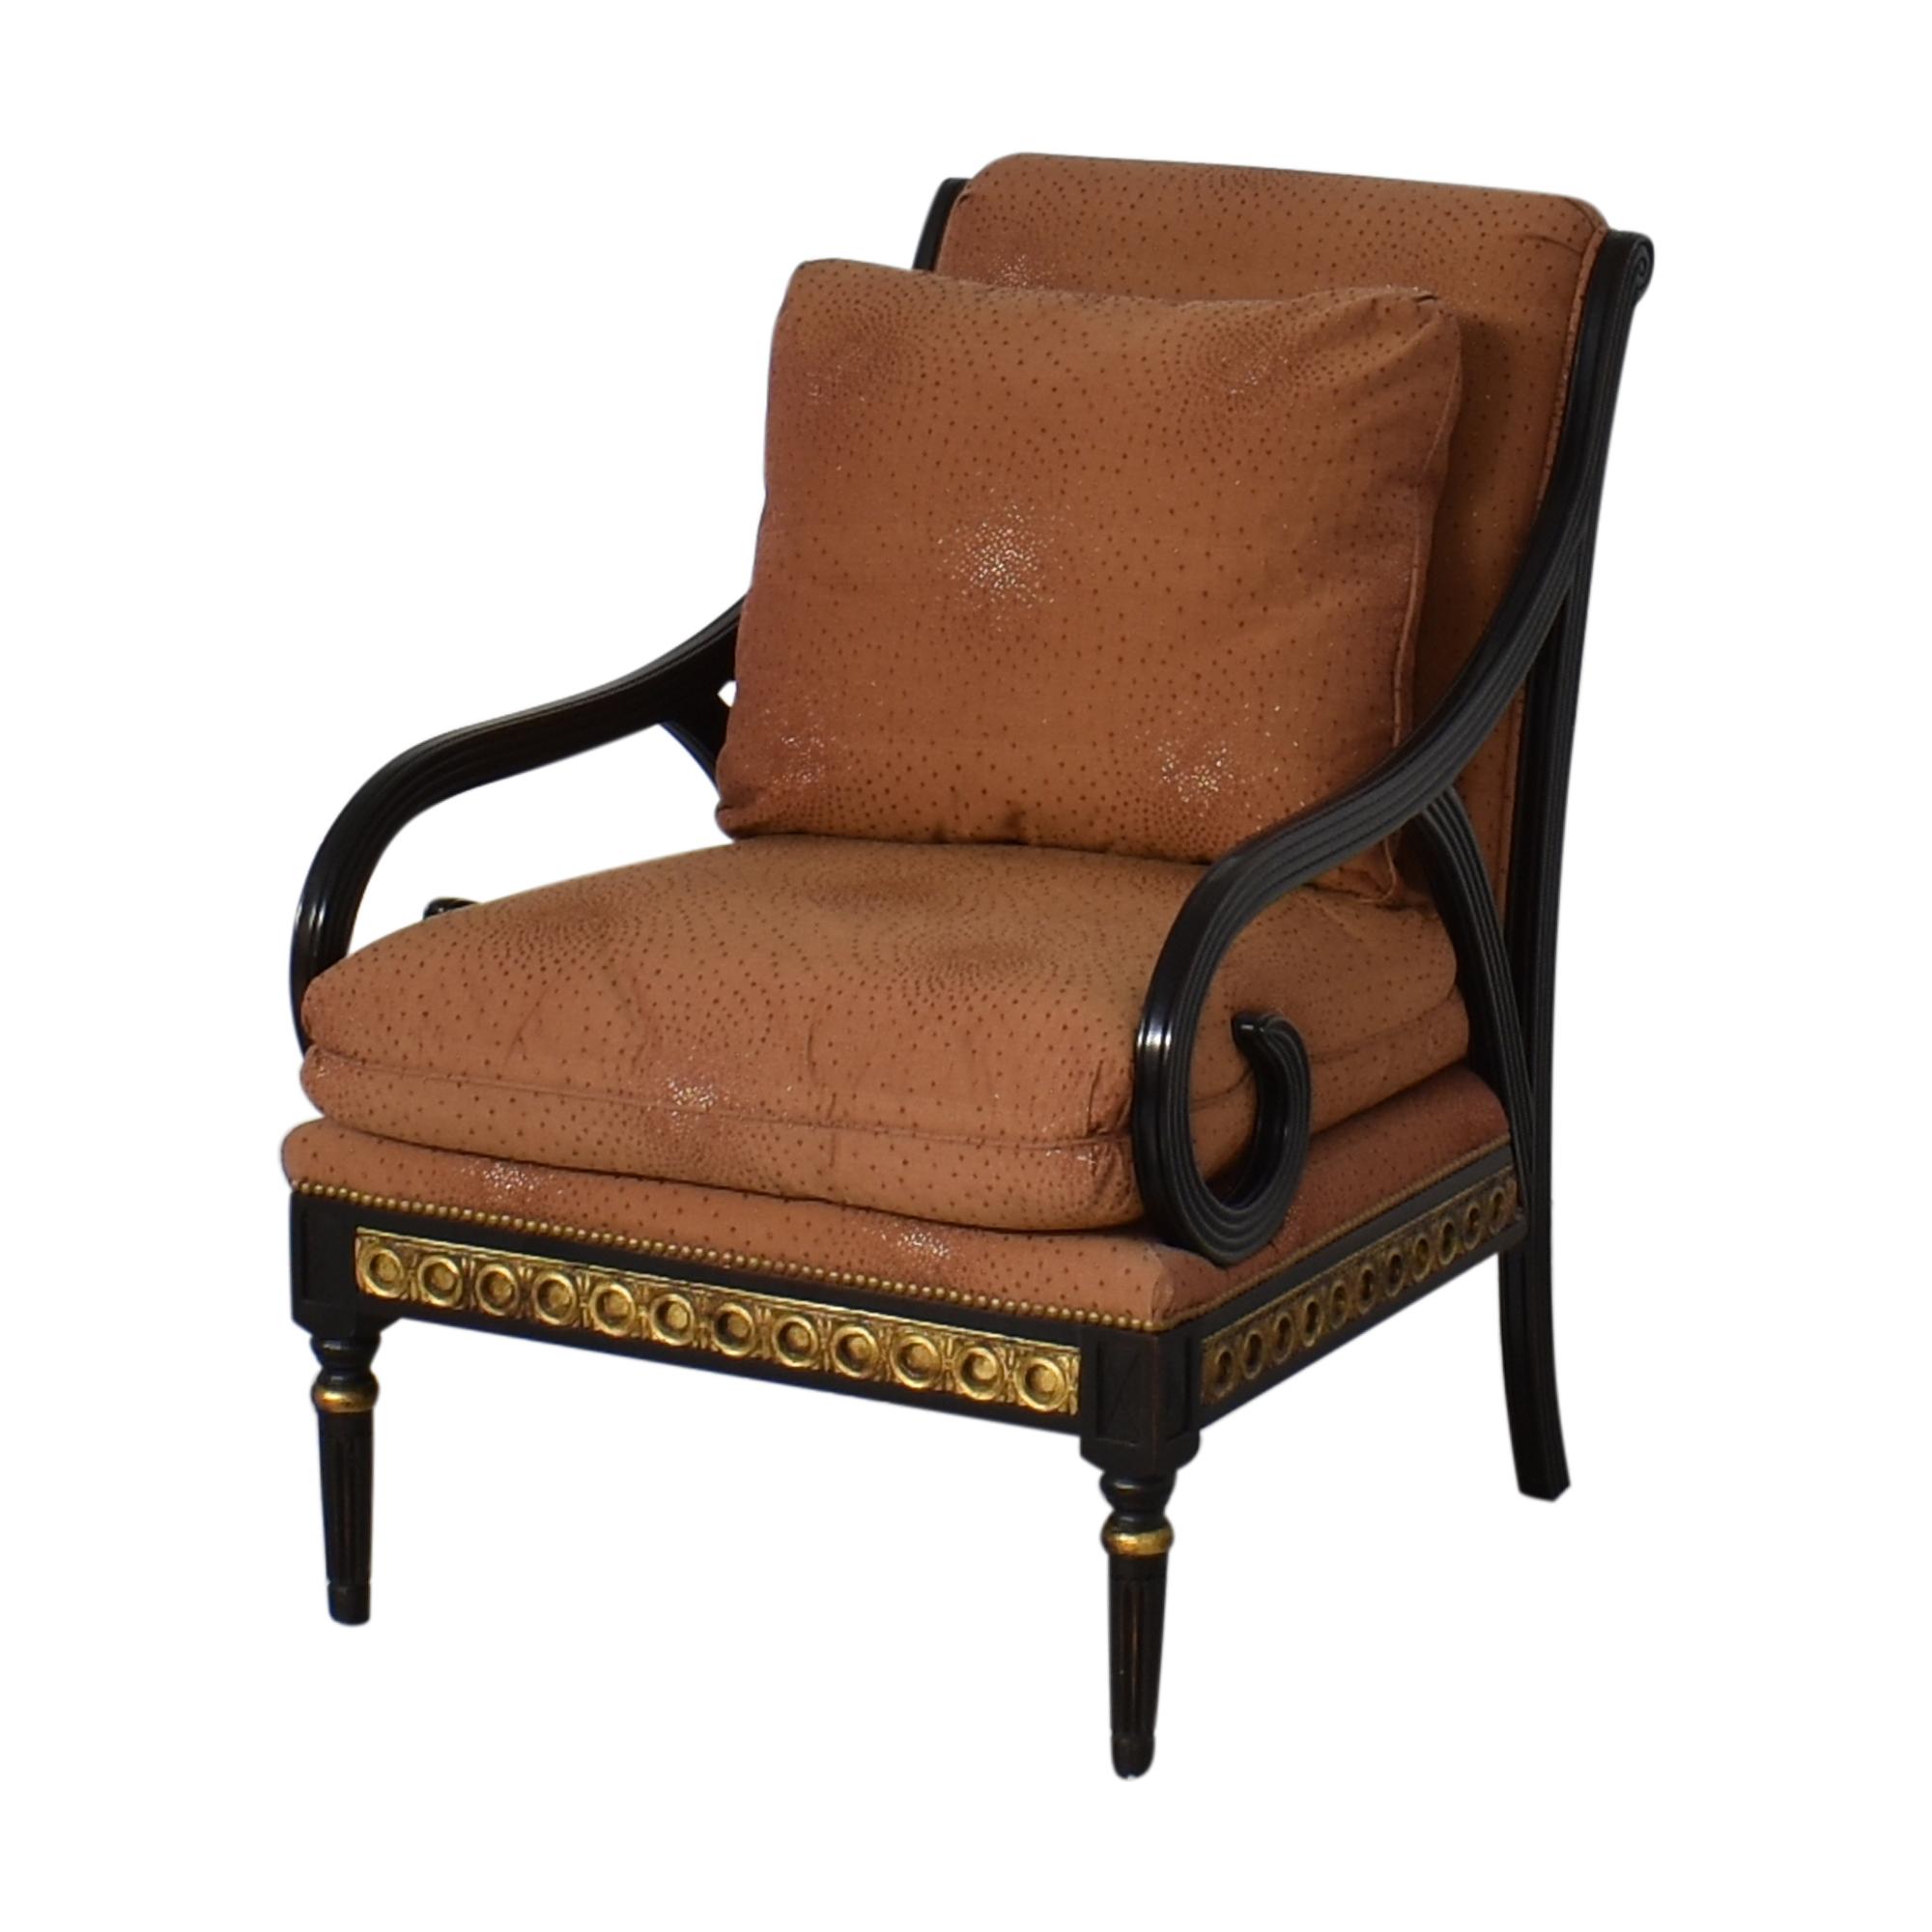 IMI Furniture IMI Furniture Scroll Arm Accent Chair dimensions